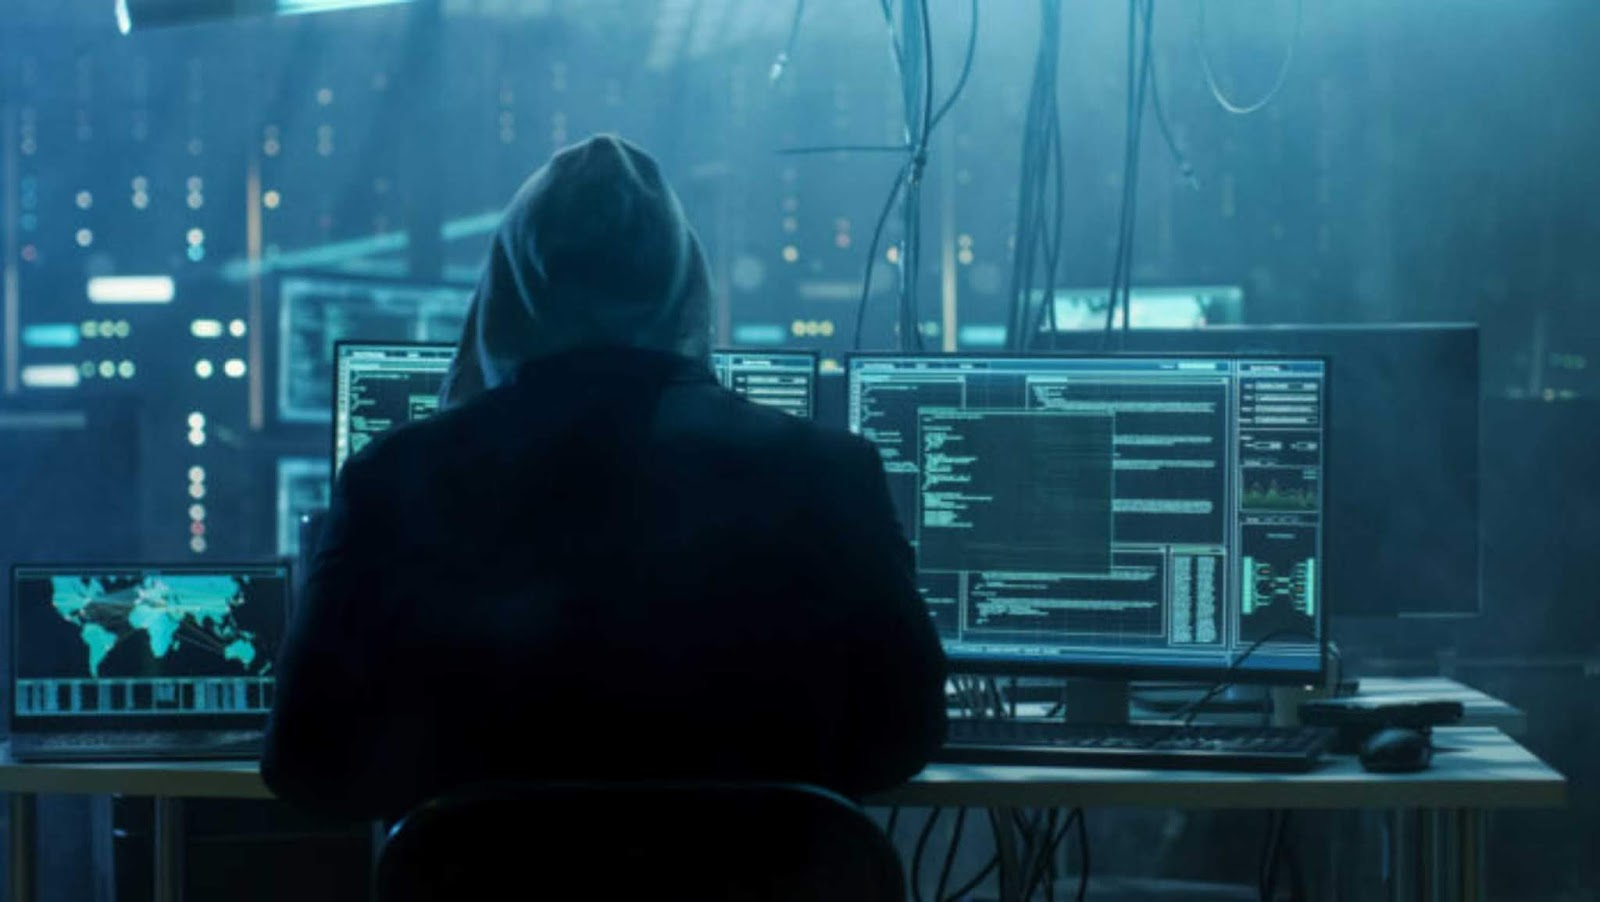 Sebelum pemilu diidentifikasi banyak serangan hacker, termasuk dari China dan Rusia